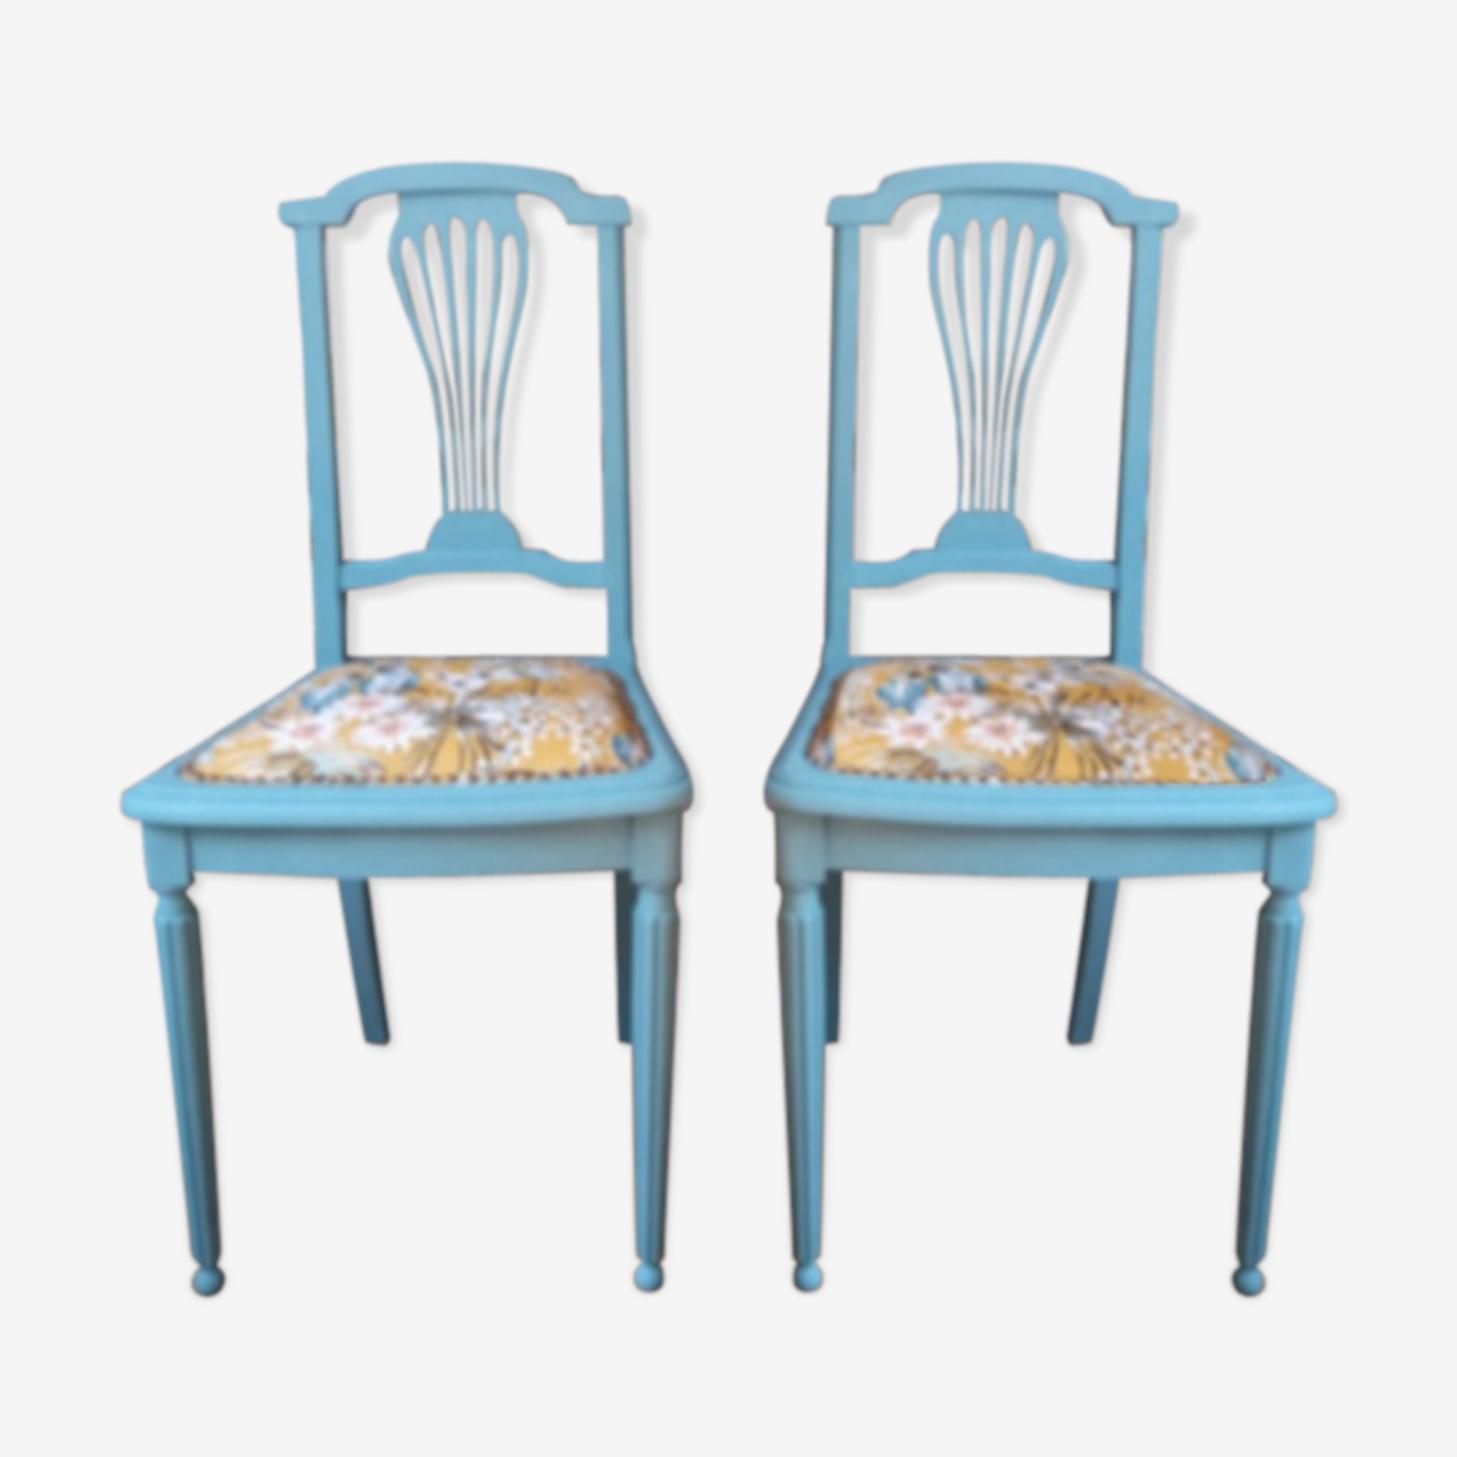 Kitchenware old chairs